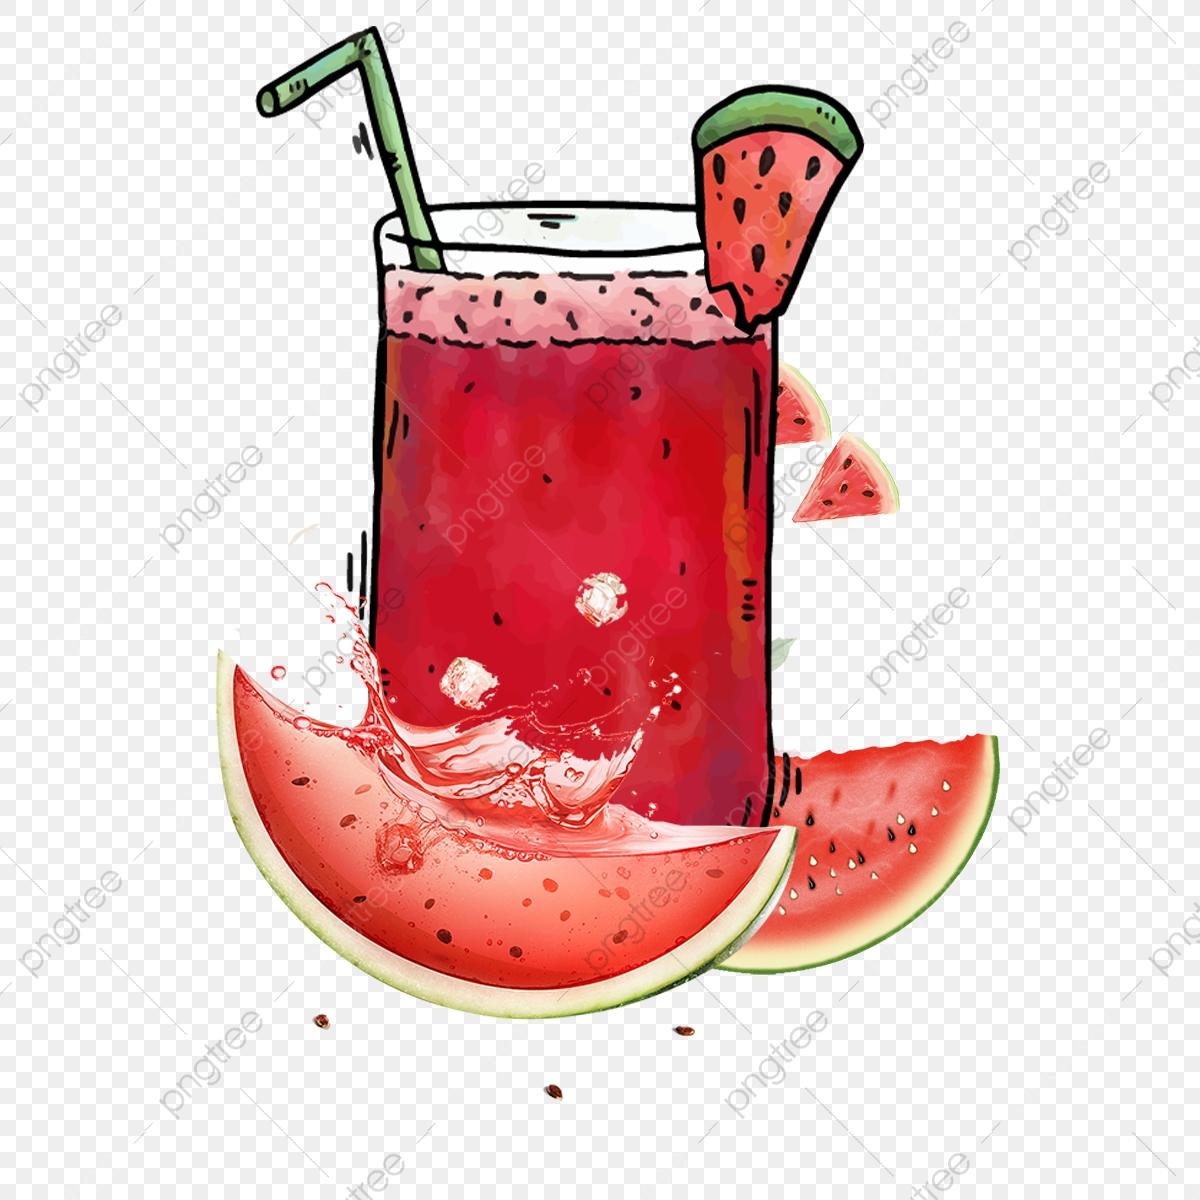 Lemon Watermelon Juice Poster, Afternoon Tea, Menu, Summer.